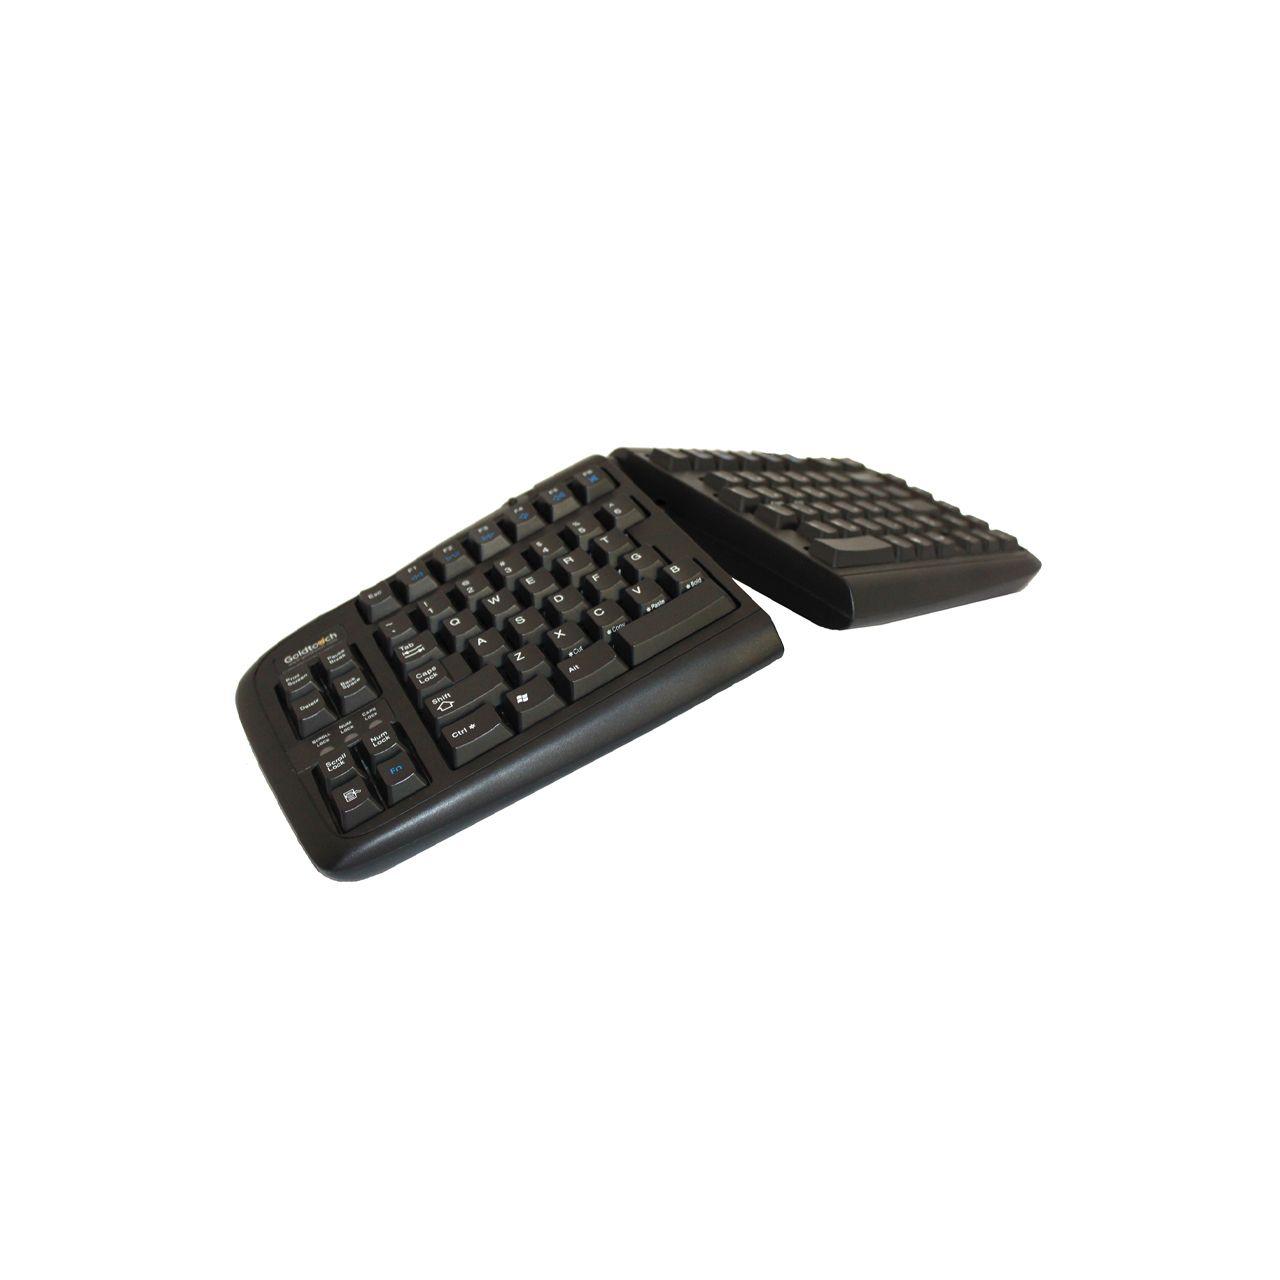 goldtouch adjustable v2 toetsenbord ERKAGOL300 Schuin